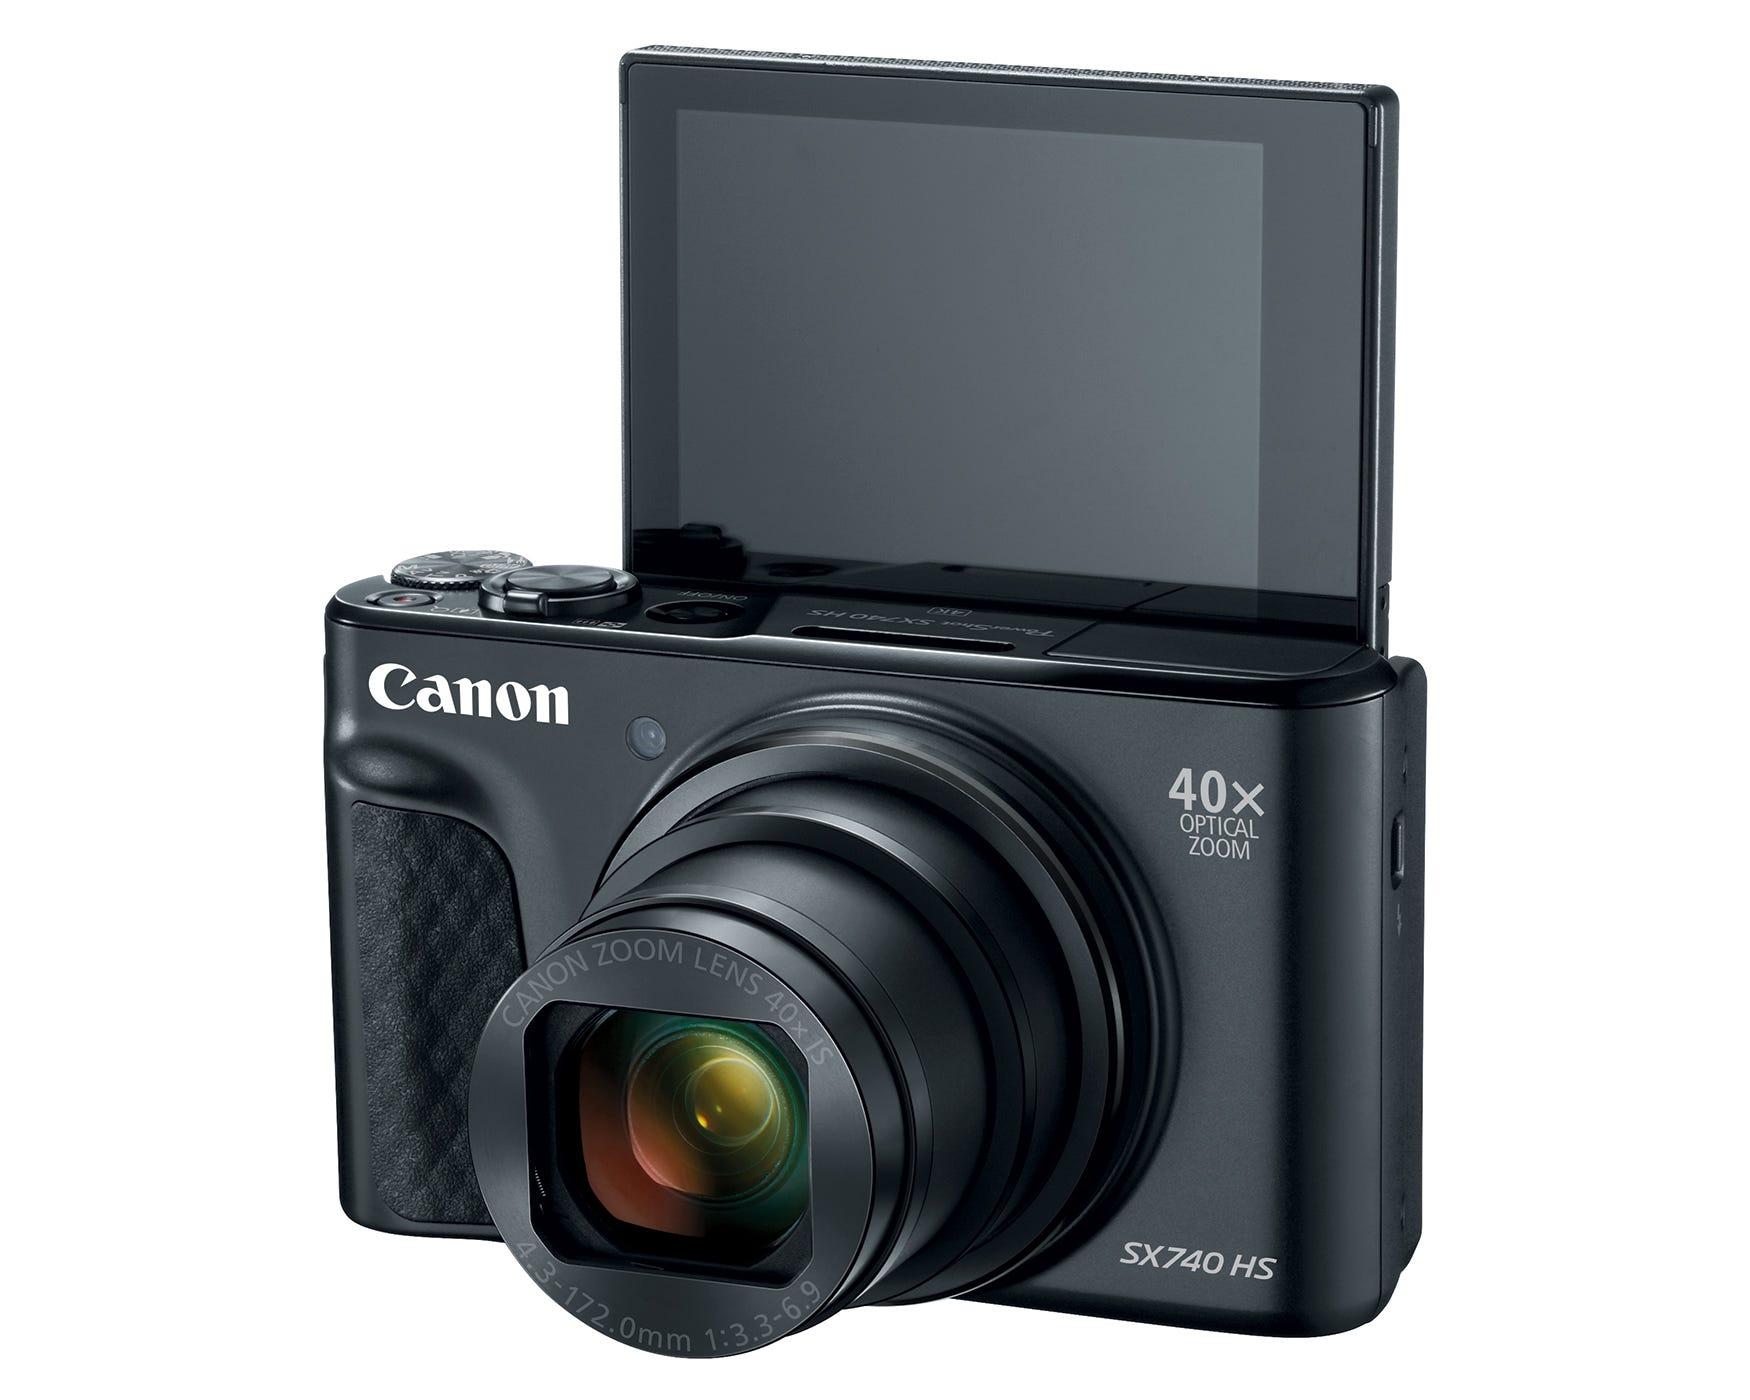 Canon PowerShot SX740 HS Digital Camera, Black